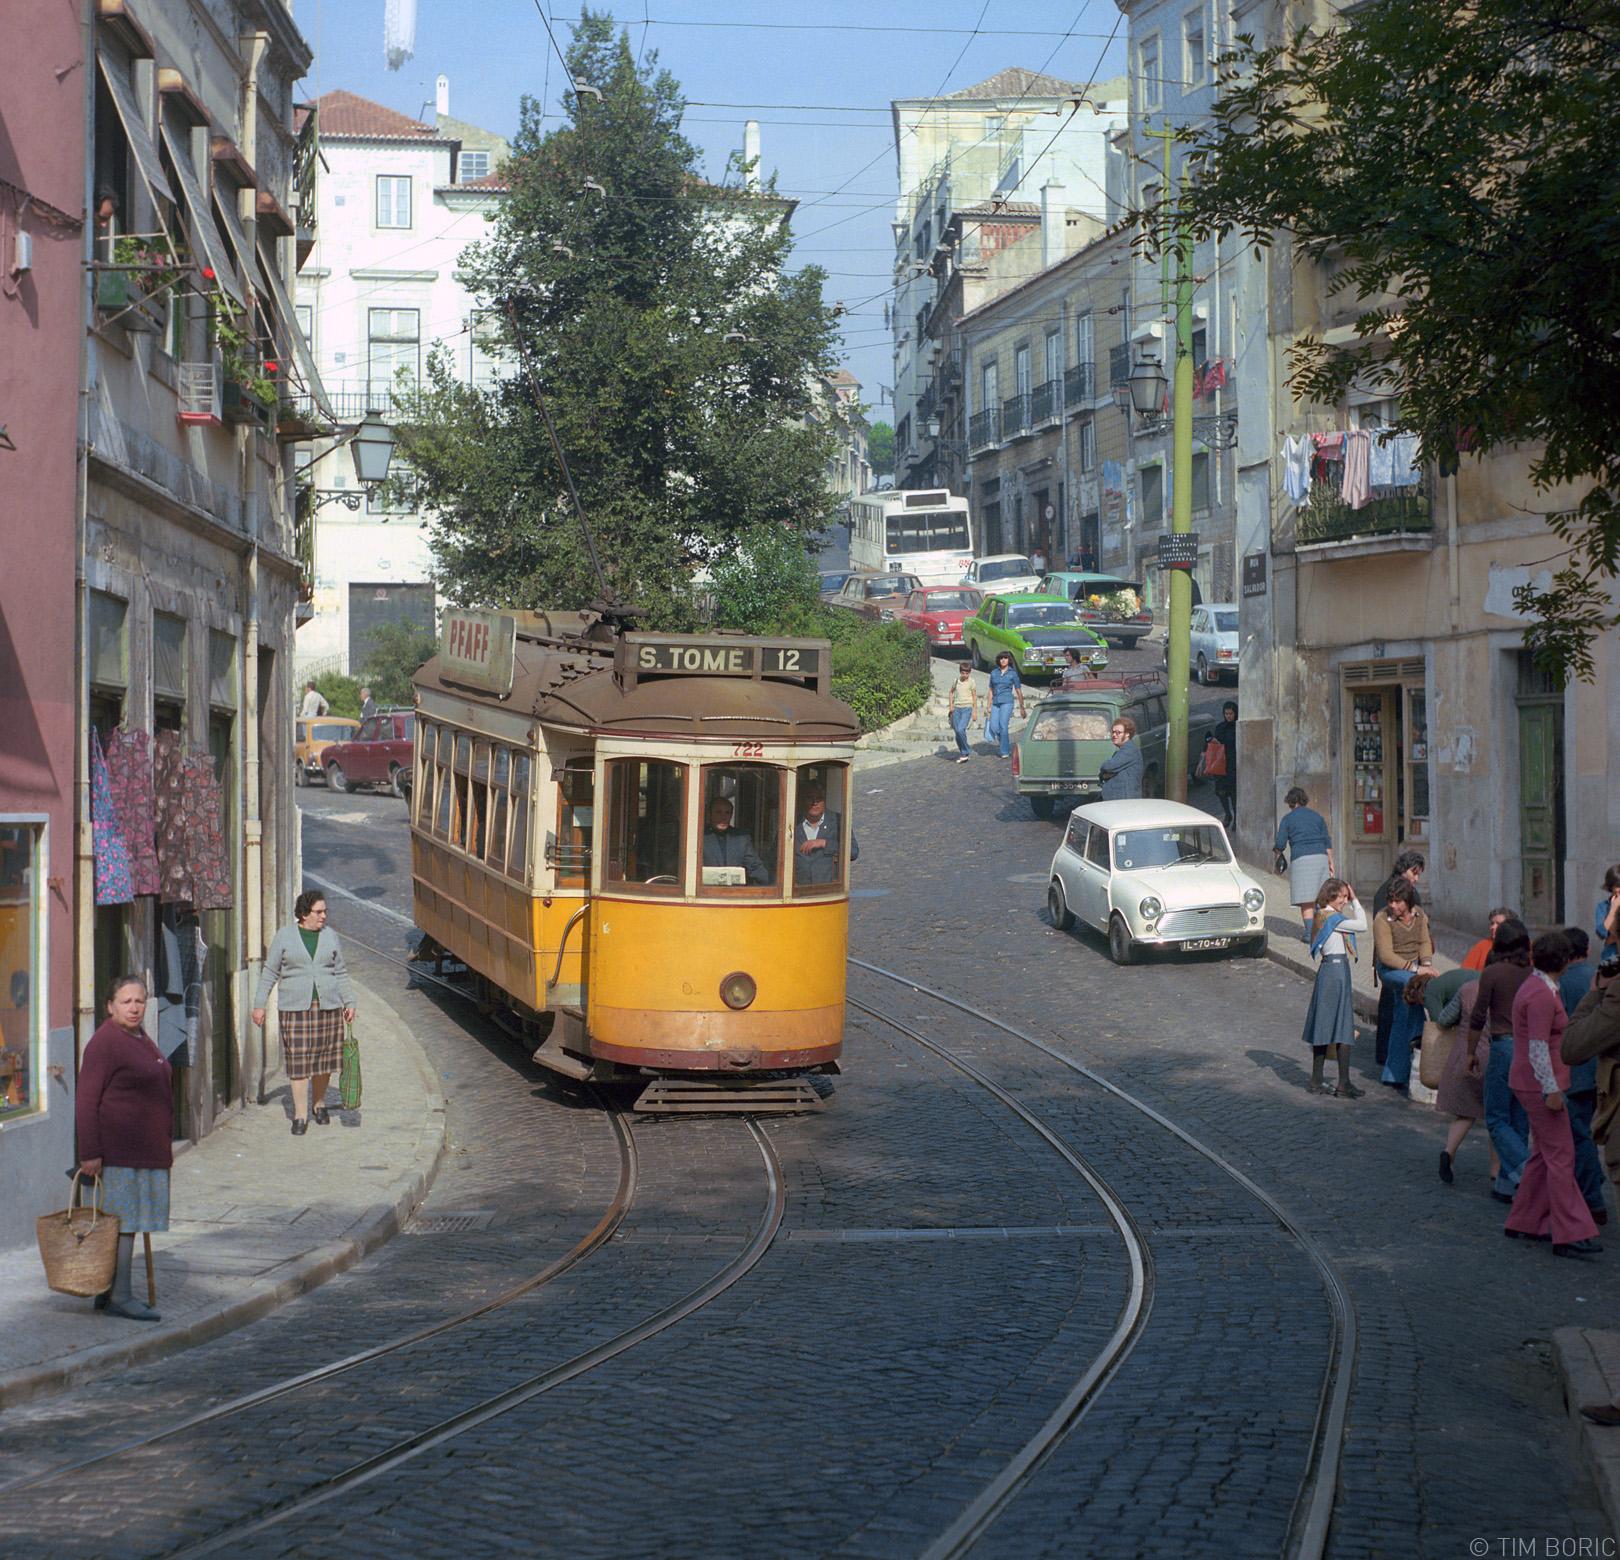 Lisboa (ainda) castiça, Rua do Salvador (T. Boric, 1978)